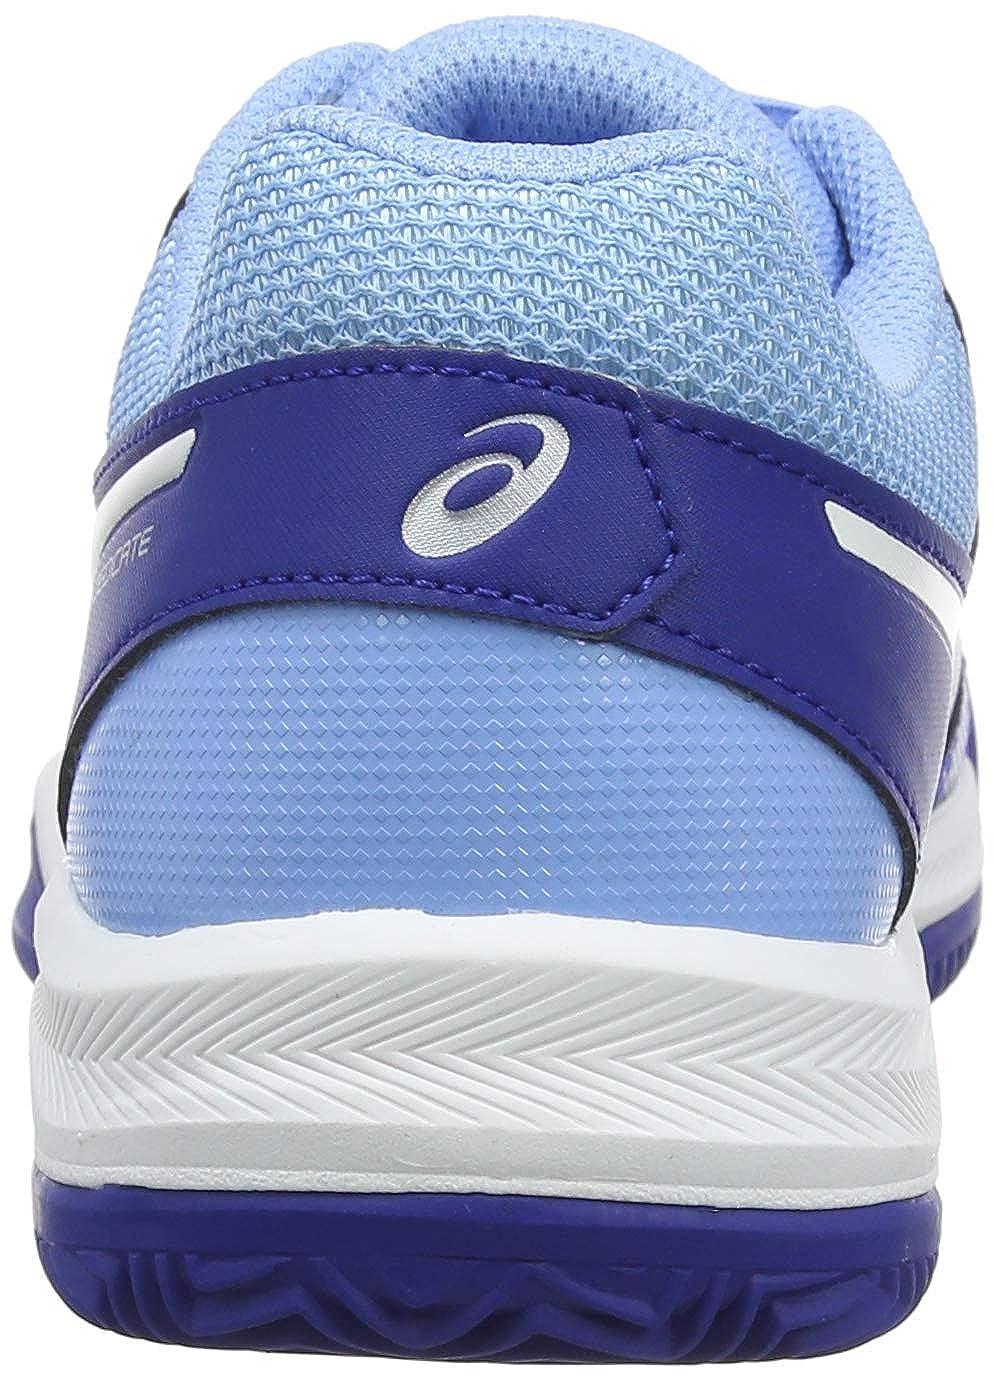 ASICS Damen Gel-Dedicate 5 Clay Tennisschuhe Blau (Monaco Blau/Weiß Blau/Weiß Blau/Weiß 400) 3fa965